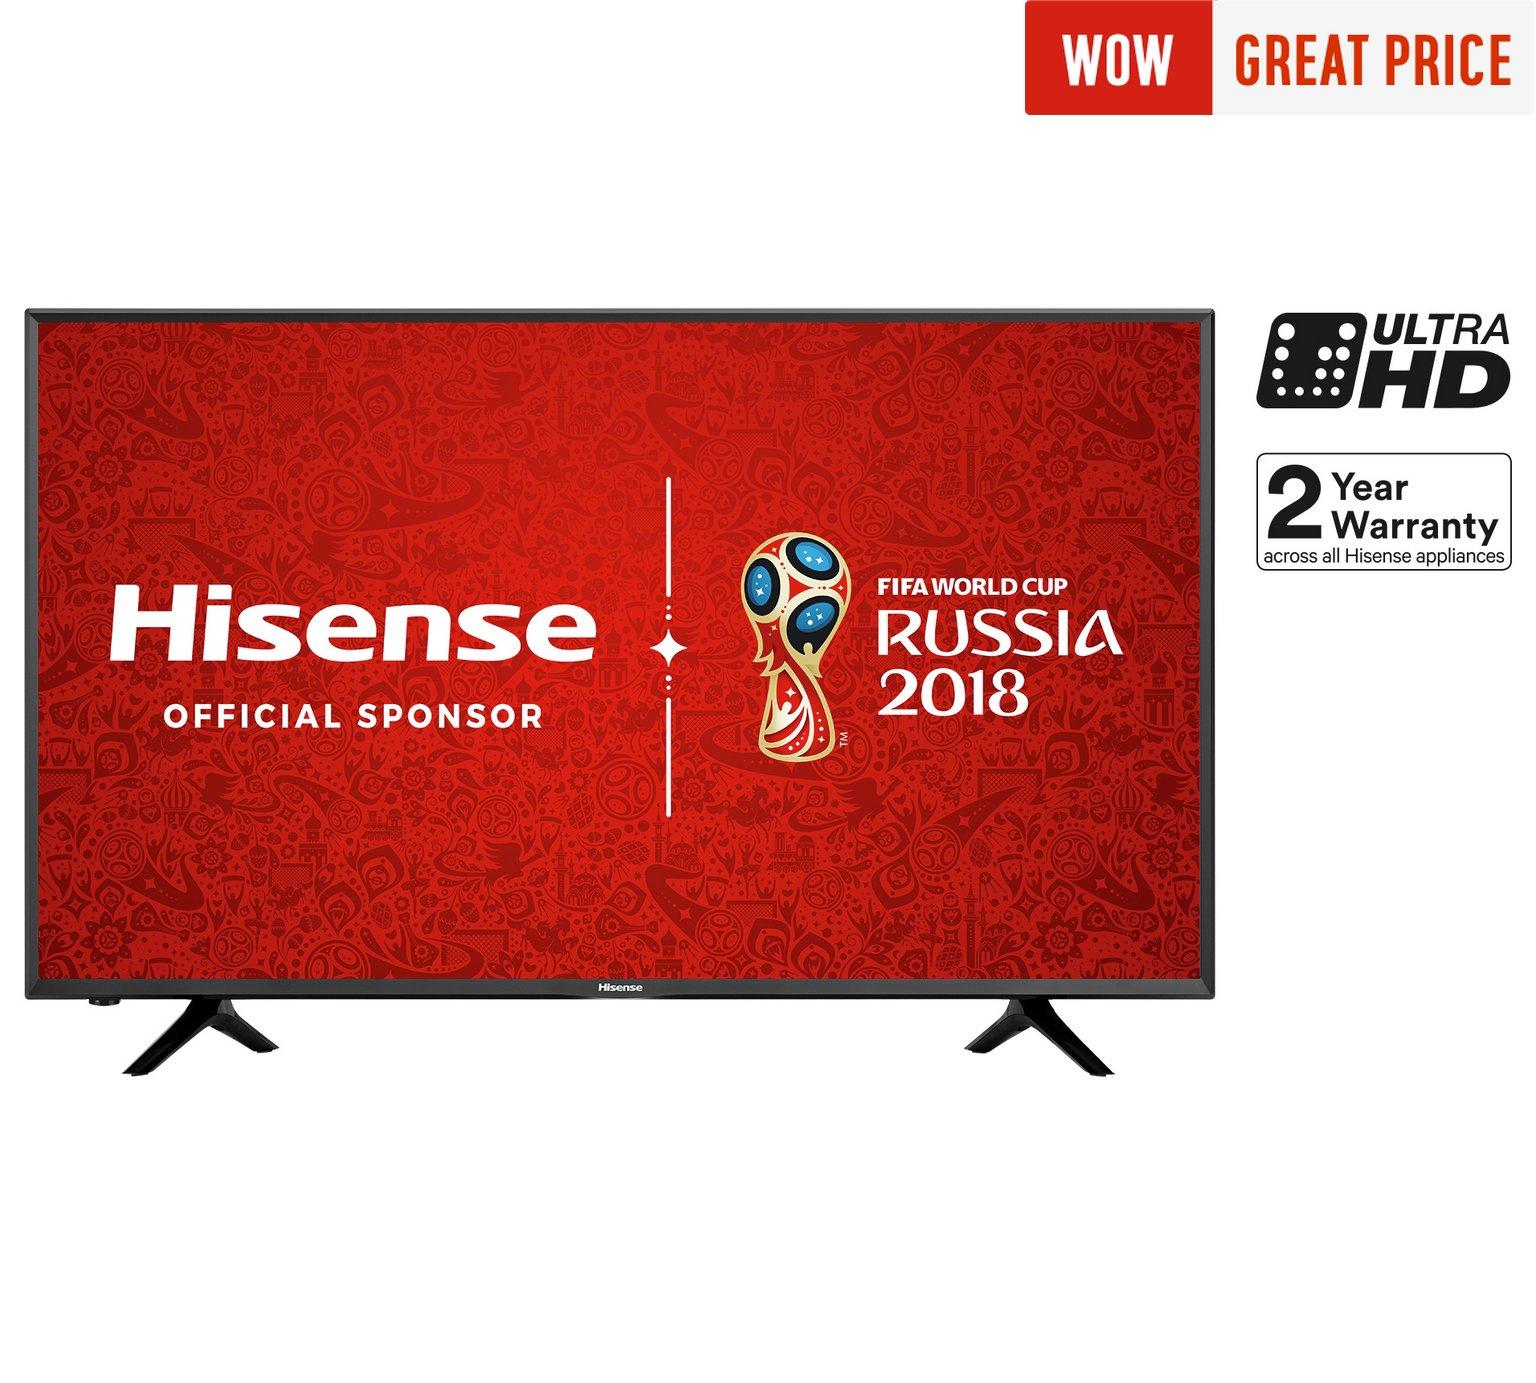 Hisense H55N5300 55 Inch 4K Ultra HD Smart TV £476.10 using 10% off code @ Argos